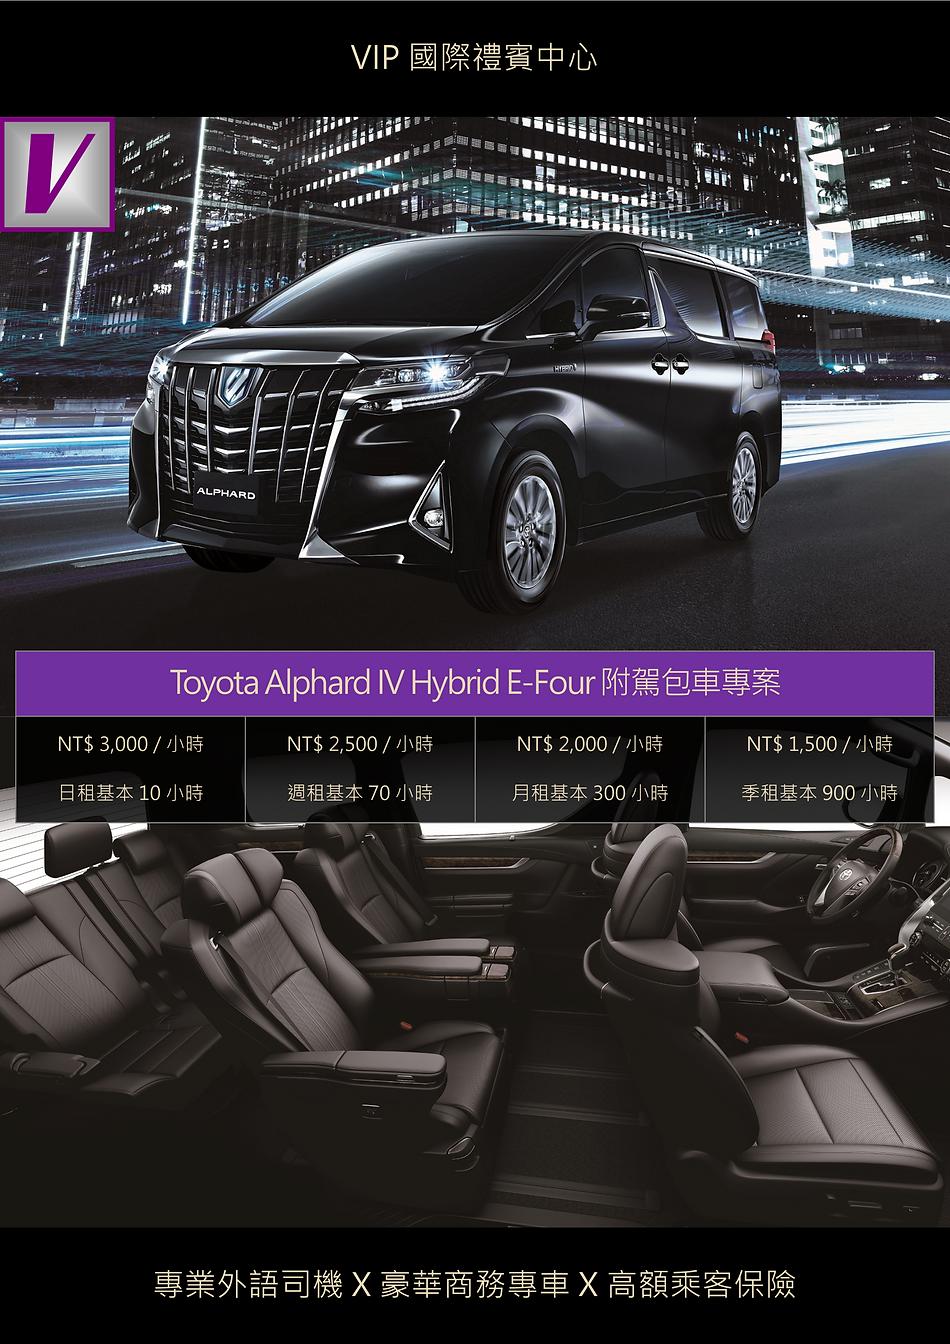 VIP國際禮賓中心 TOYOTA ALPHARD IV HYBRID E-FOUR 附駕包車專案 DM.png